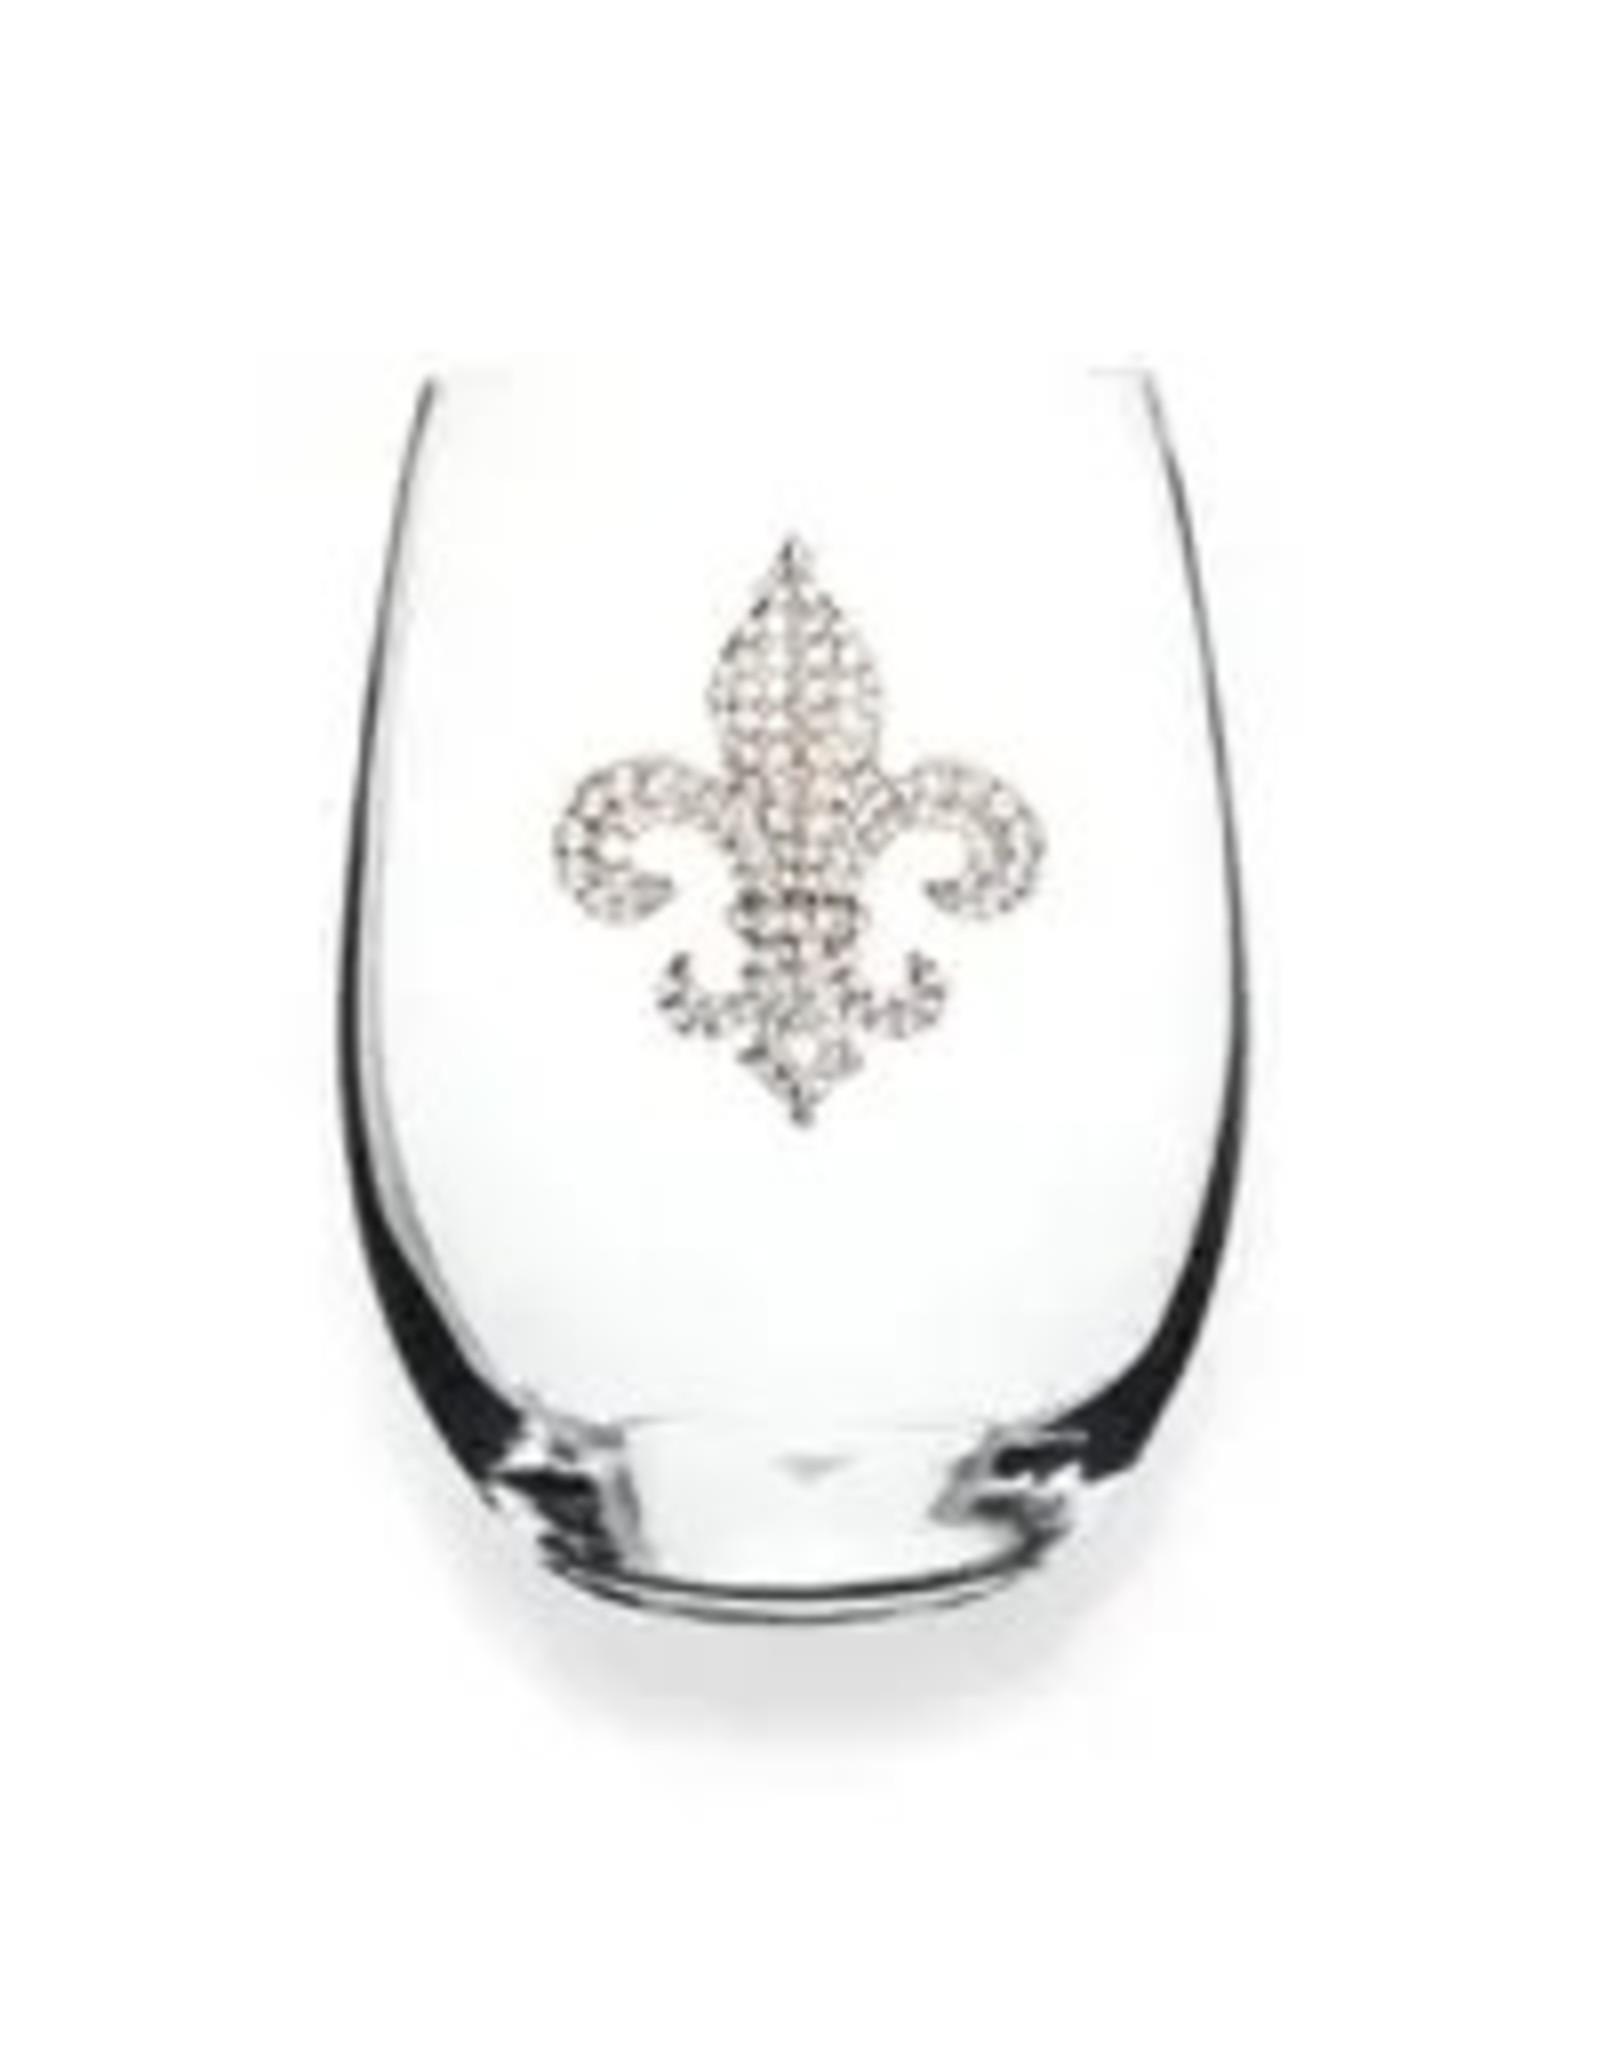 The Queen's Jewels Diamond FDL Jeweled Stemless Wine